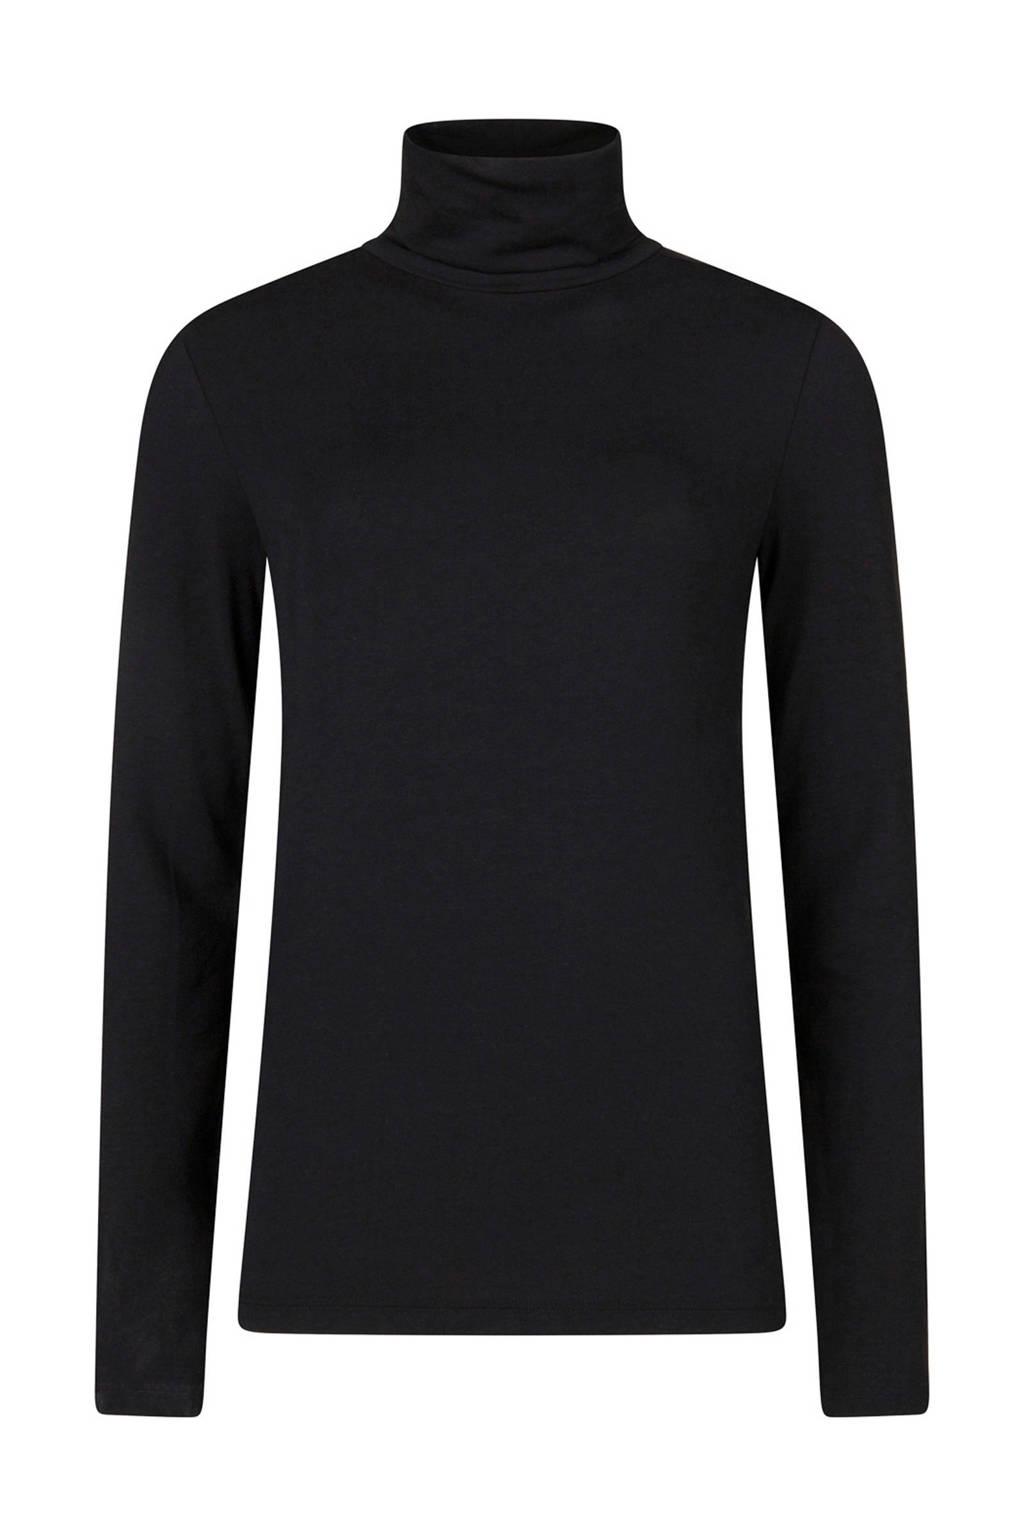 WE Fashion top met col zwart, Zwart